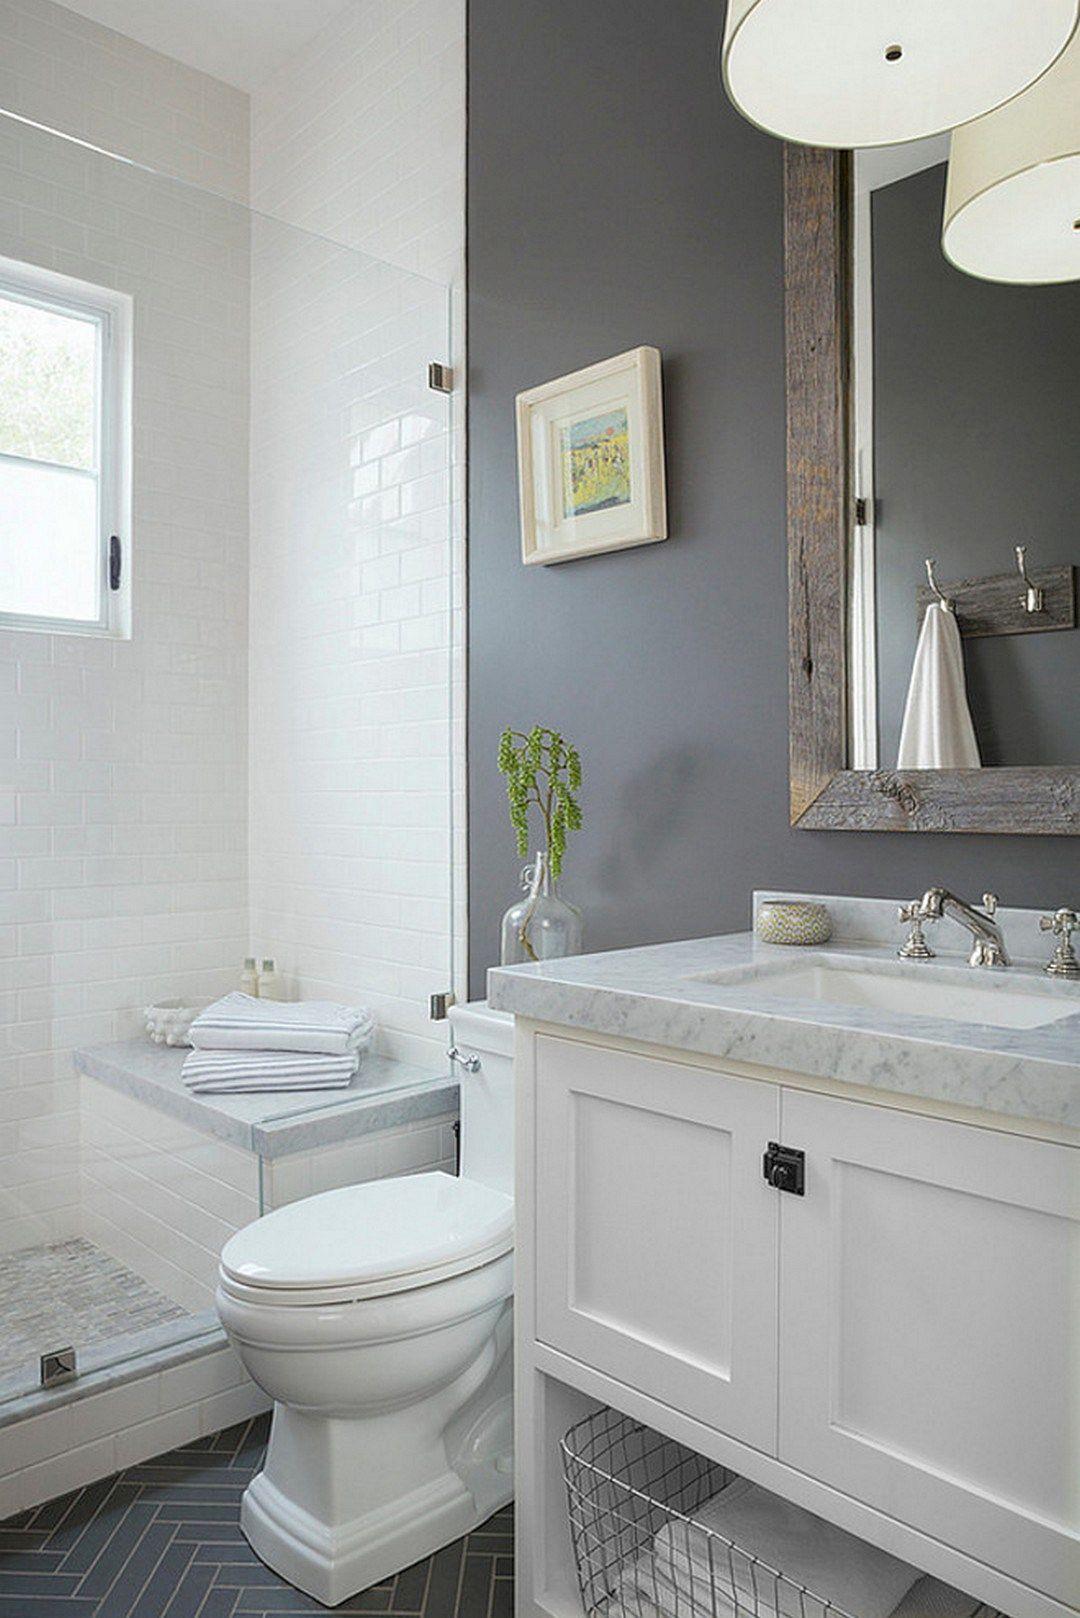 16 Small Bathroom Renovation Ideas Small Master Bathroom Small Bathroom Renovations Bathroom Remodel Master